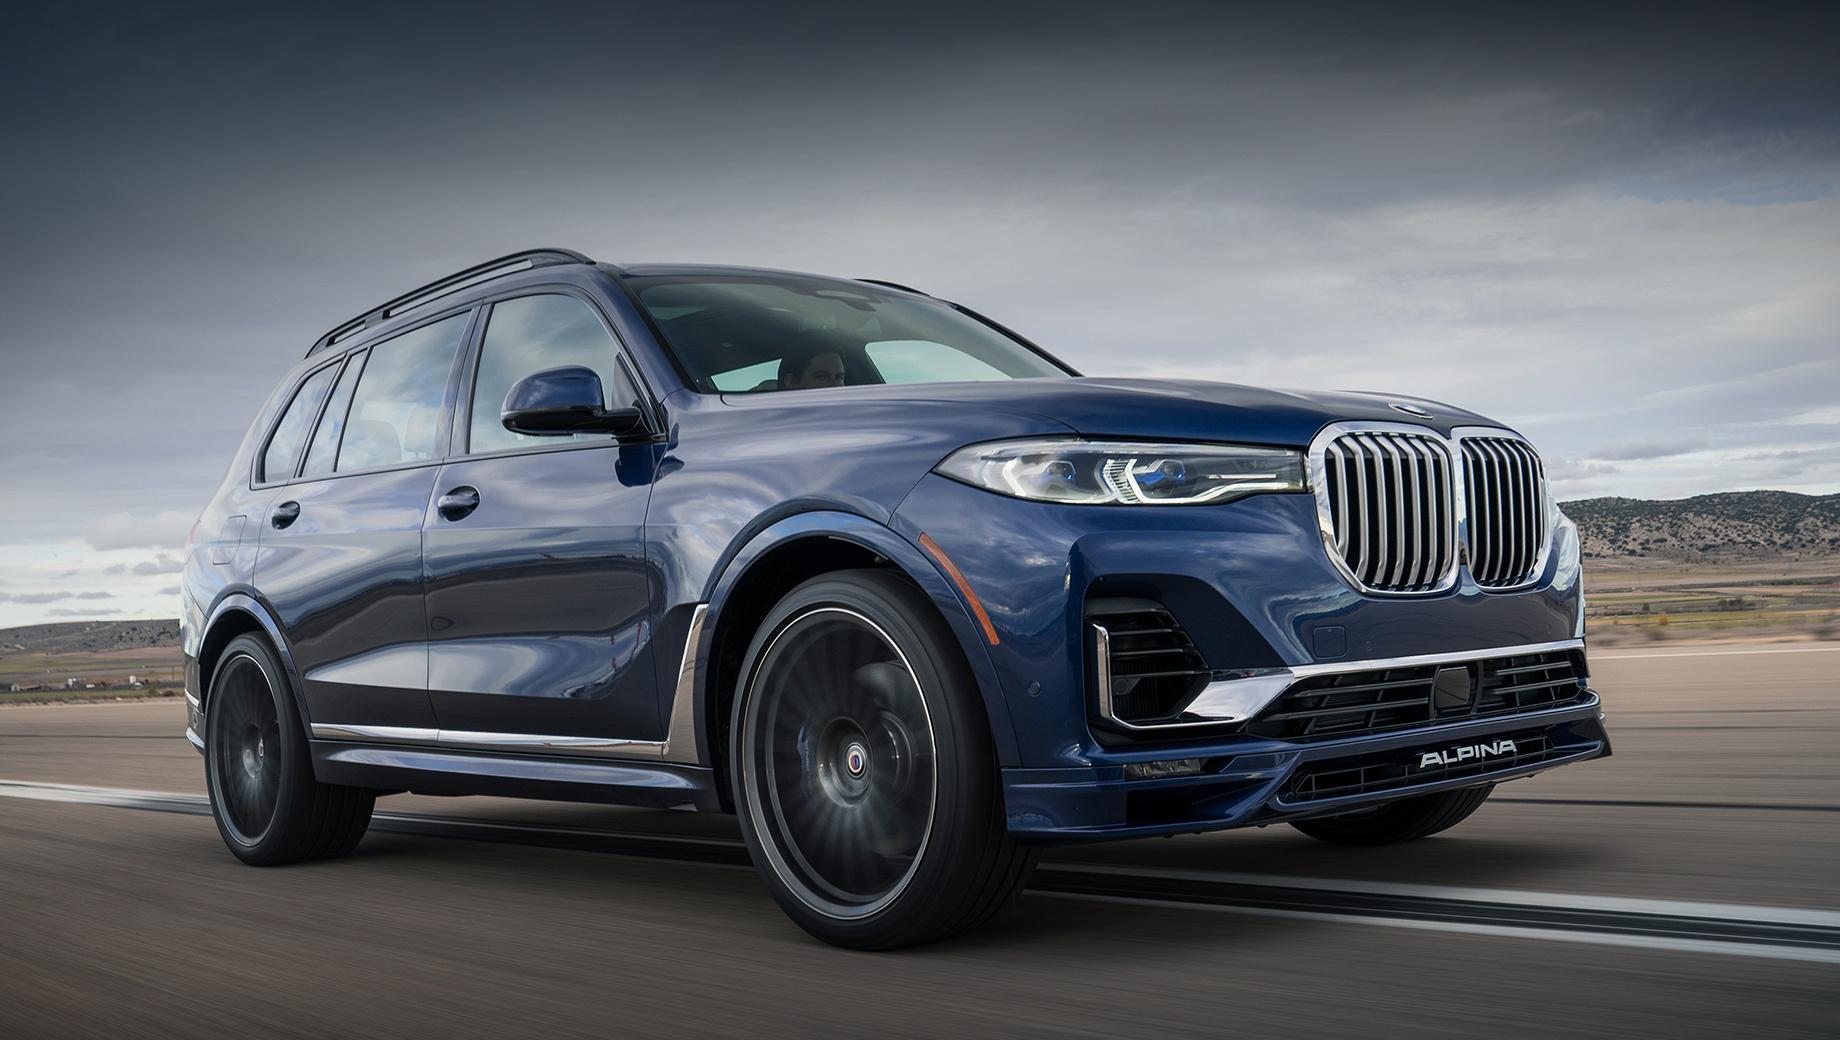 Bmw x7,Alpina xb7. Alpina XB7 внешне отличается накладками на бамперы, колёсами и квартетом выпускных патрубков. В Германии Alpina XB7 стоит от 155 200 евро (12,3 млн рублей). Для сравнения: за BMW X7 M50i просят 115 400 евро (9,1 млн), а за Mercedes-AMG GLS 63 — 150 300 евро (11,8 млн).